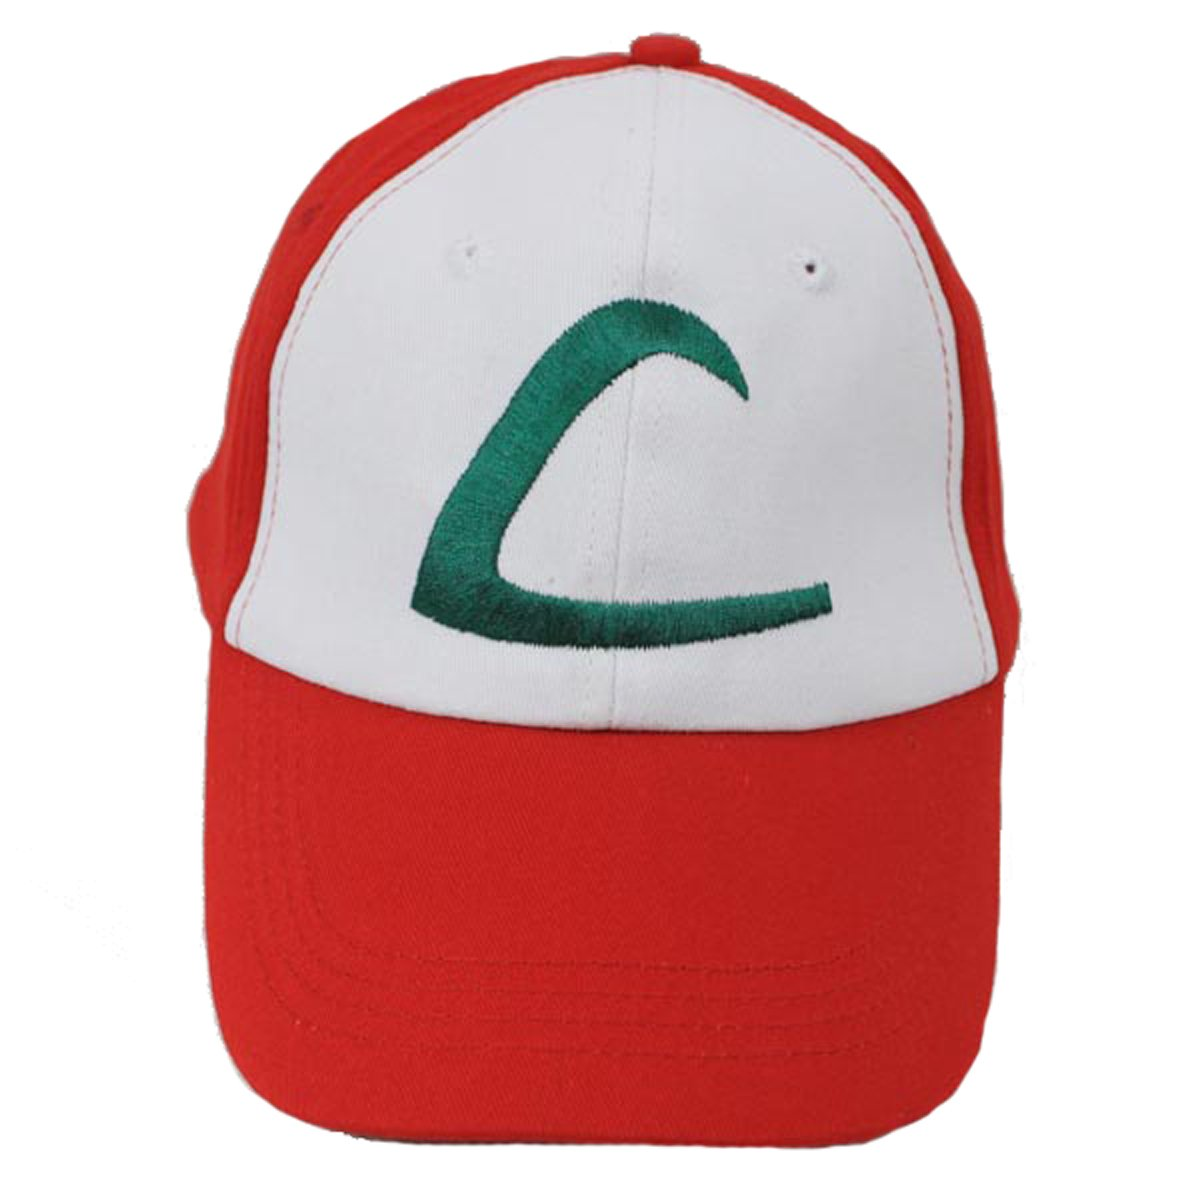 Pokemon Ash Ketchum Trainer Costume Cosplay Baseball Hat Cap Summber